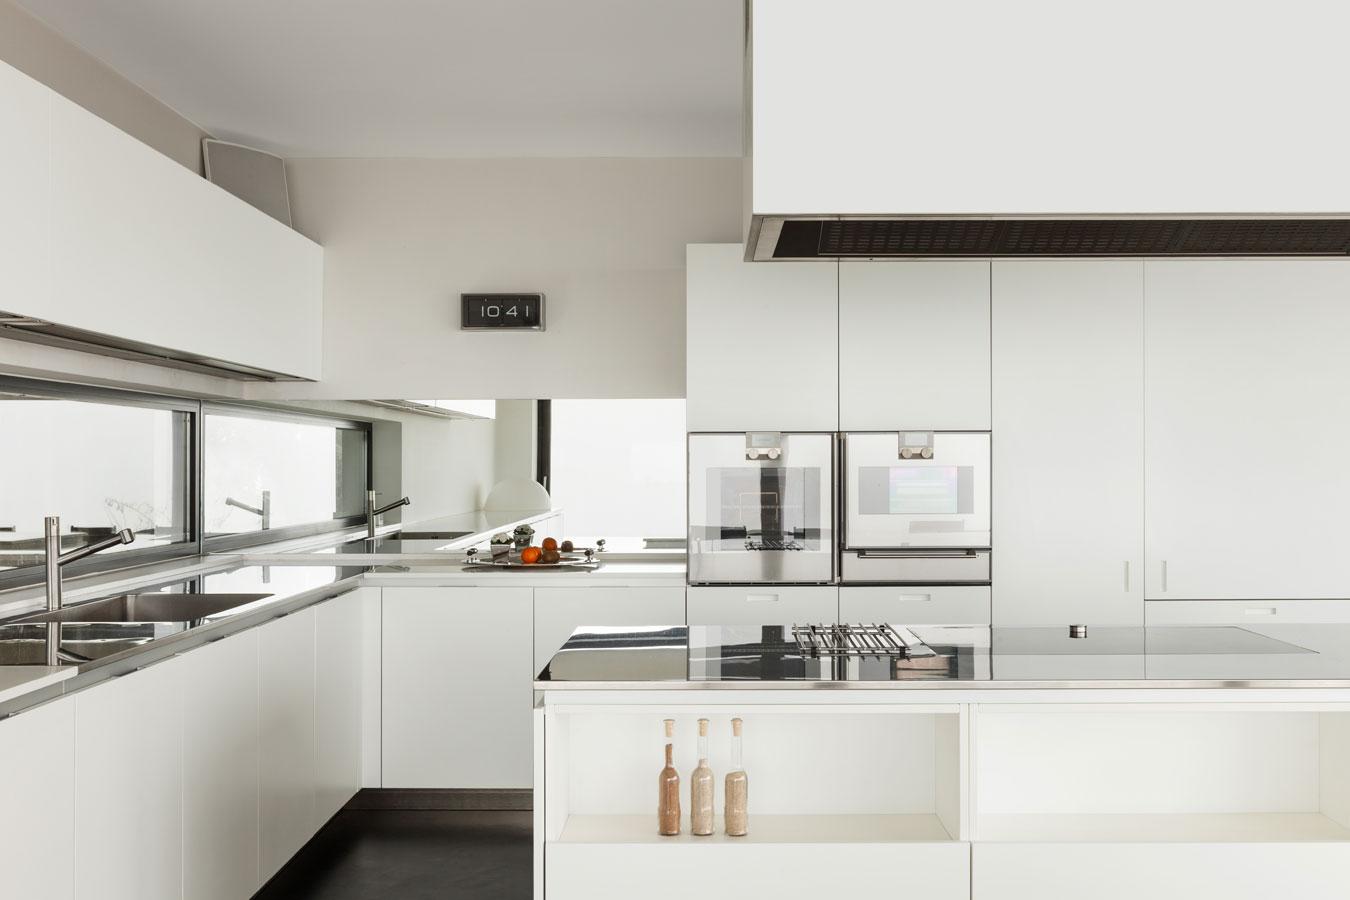 Keuken Plattegrond Open : Keuken ideeën tips keukens ontwerpen & inspiratie fotos